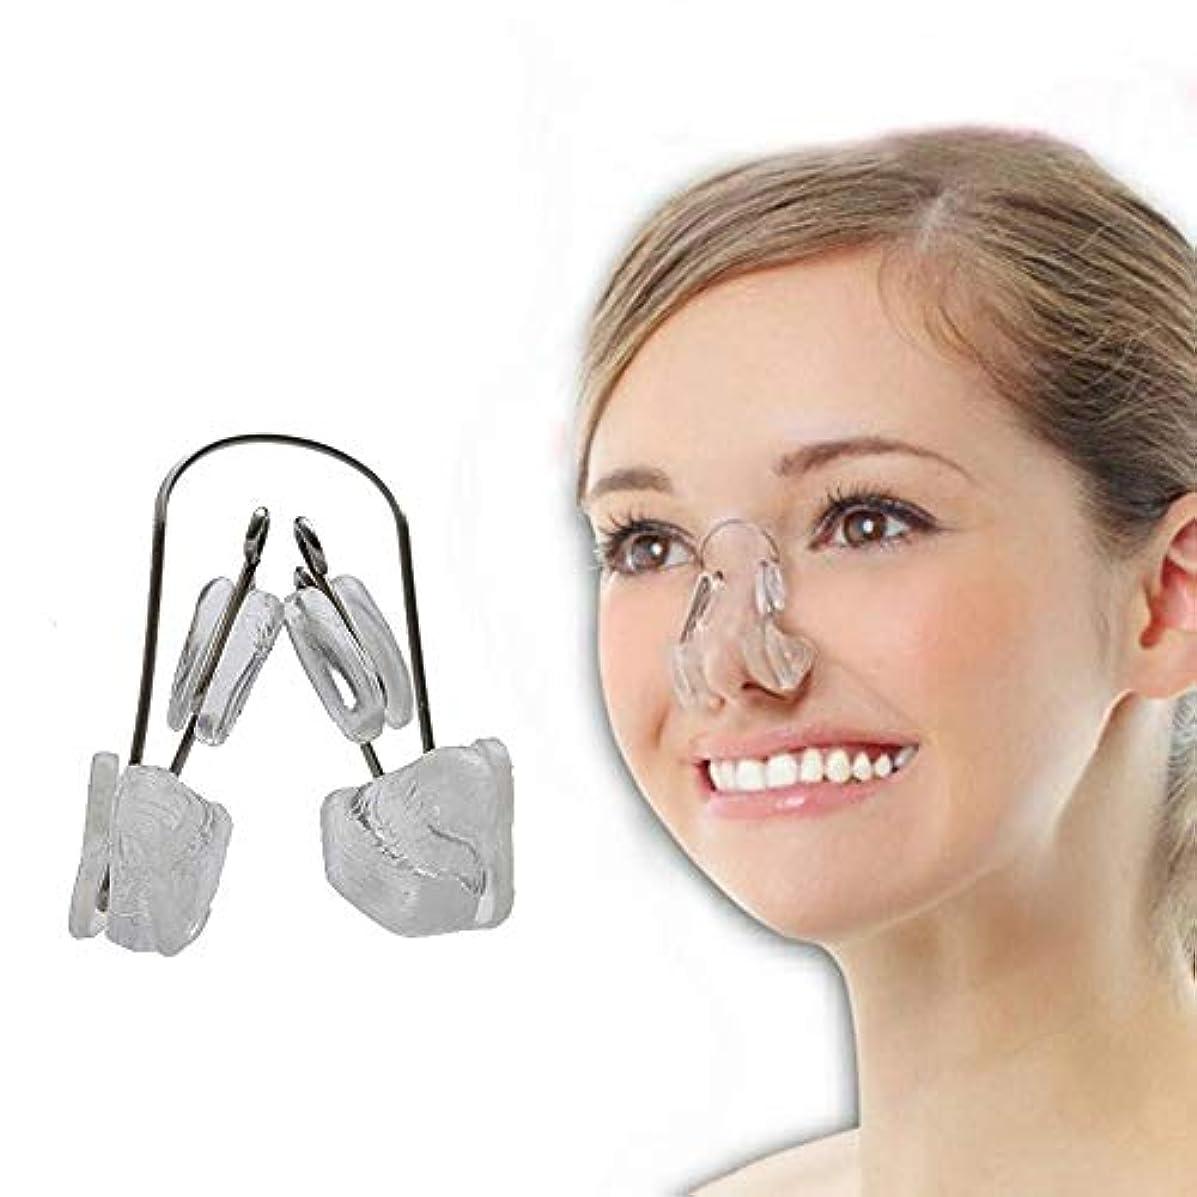 Lindexs ないノーズアップピン ノーズアップピン 美鼻クリップ 鼻高く 鼻筋 矯正 (クリア)